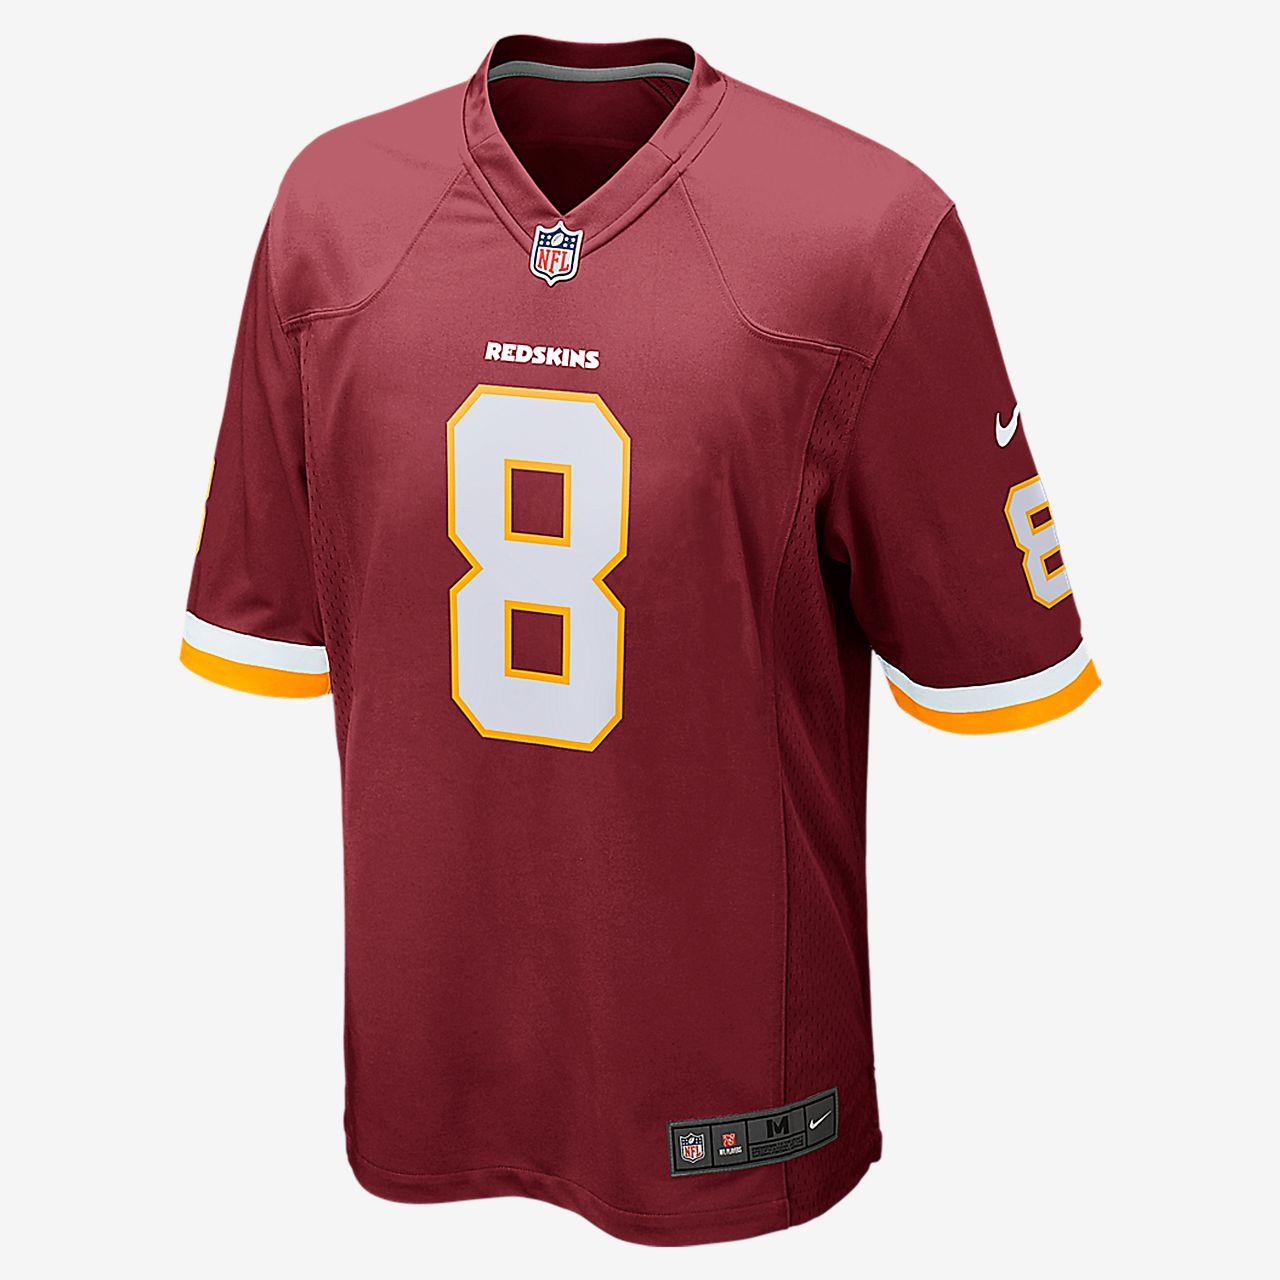 NFL Washington Redskins (Kirk Cousins) Herren-Football-Heimtrikot